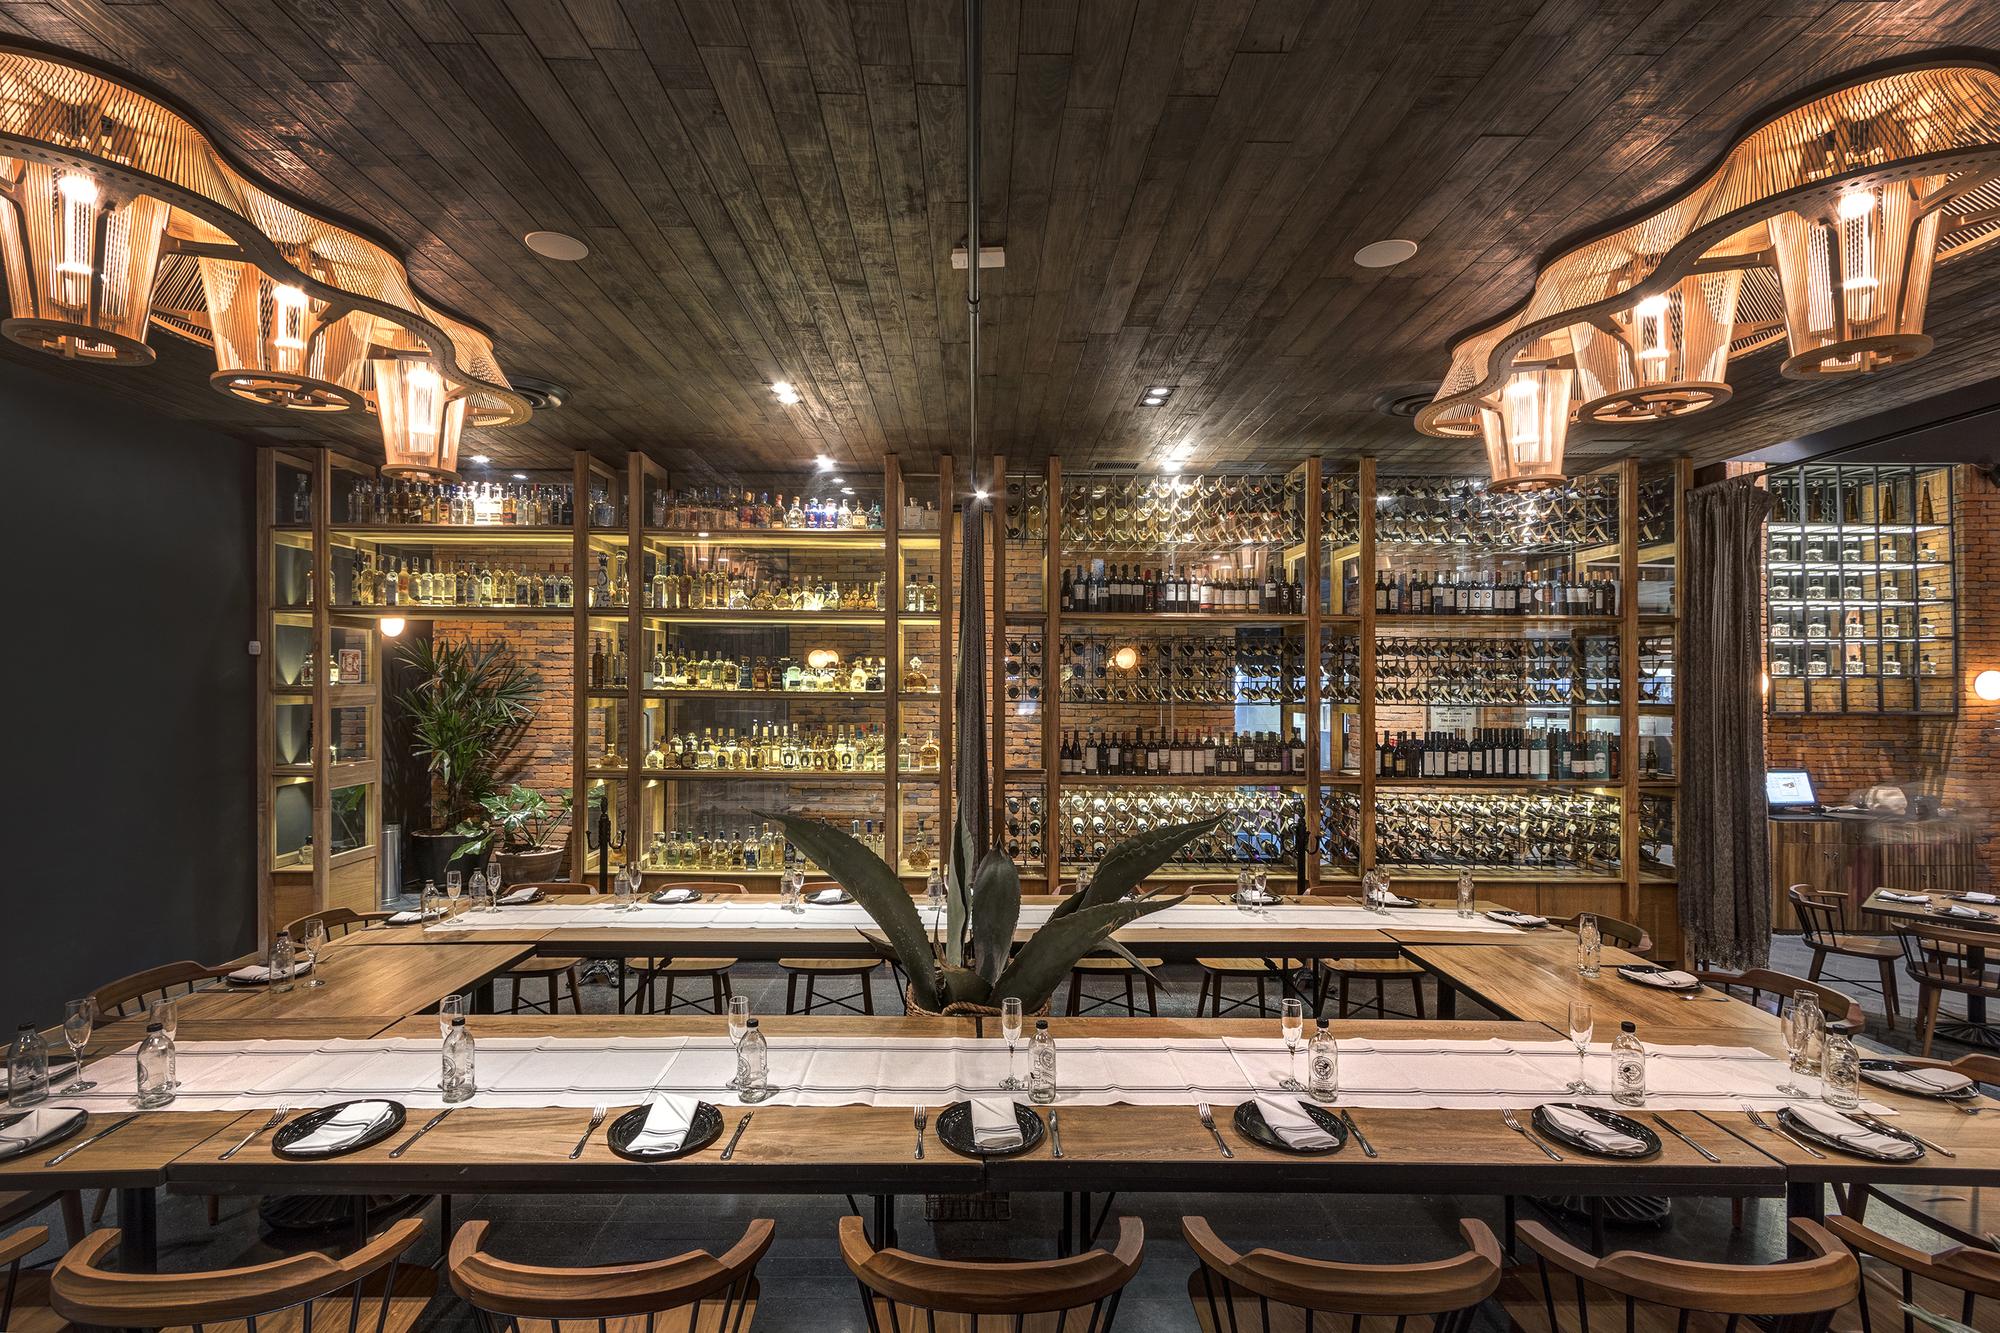 Restaurante la tequila le n le n orraca arquitectos for Restaurante escuela de arquitectos madrid